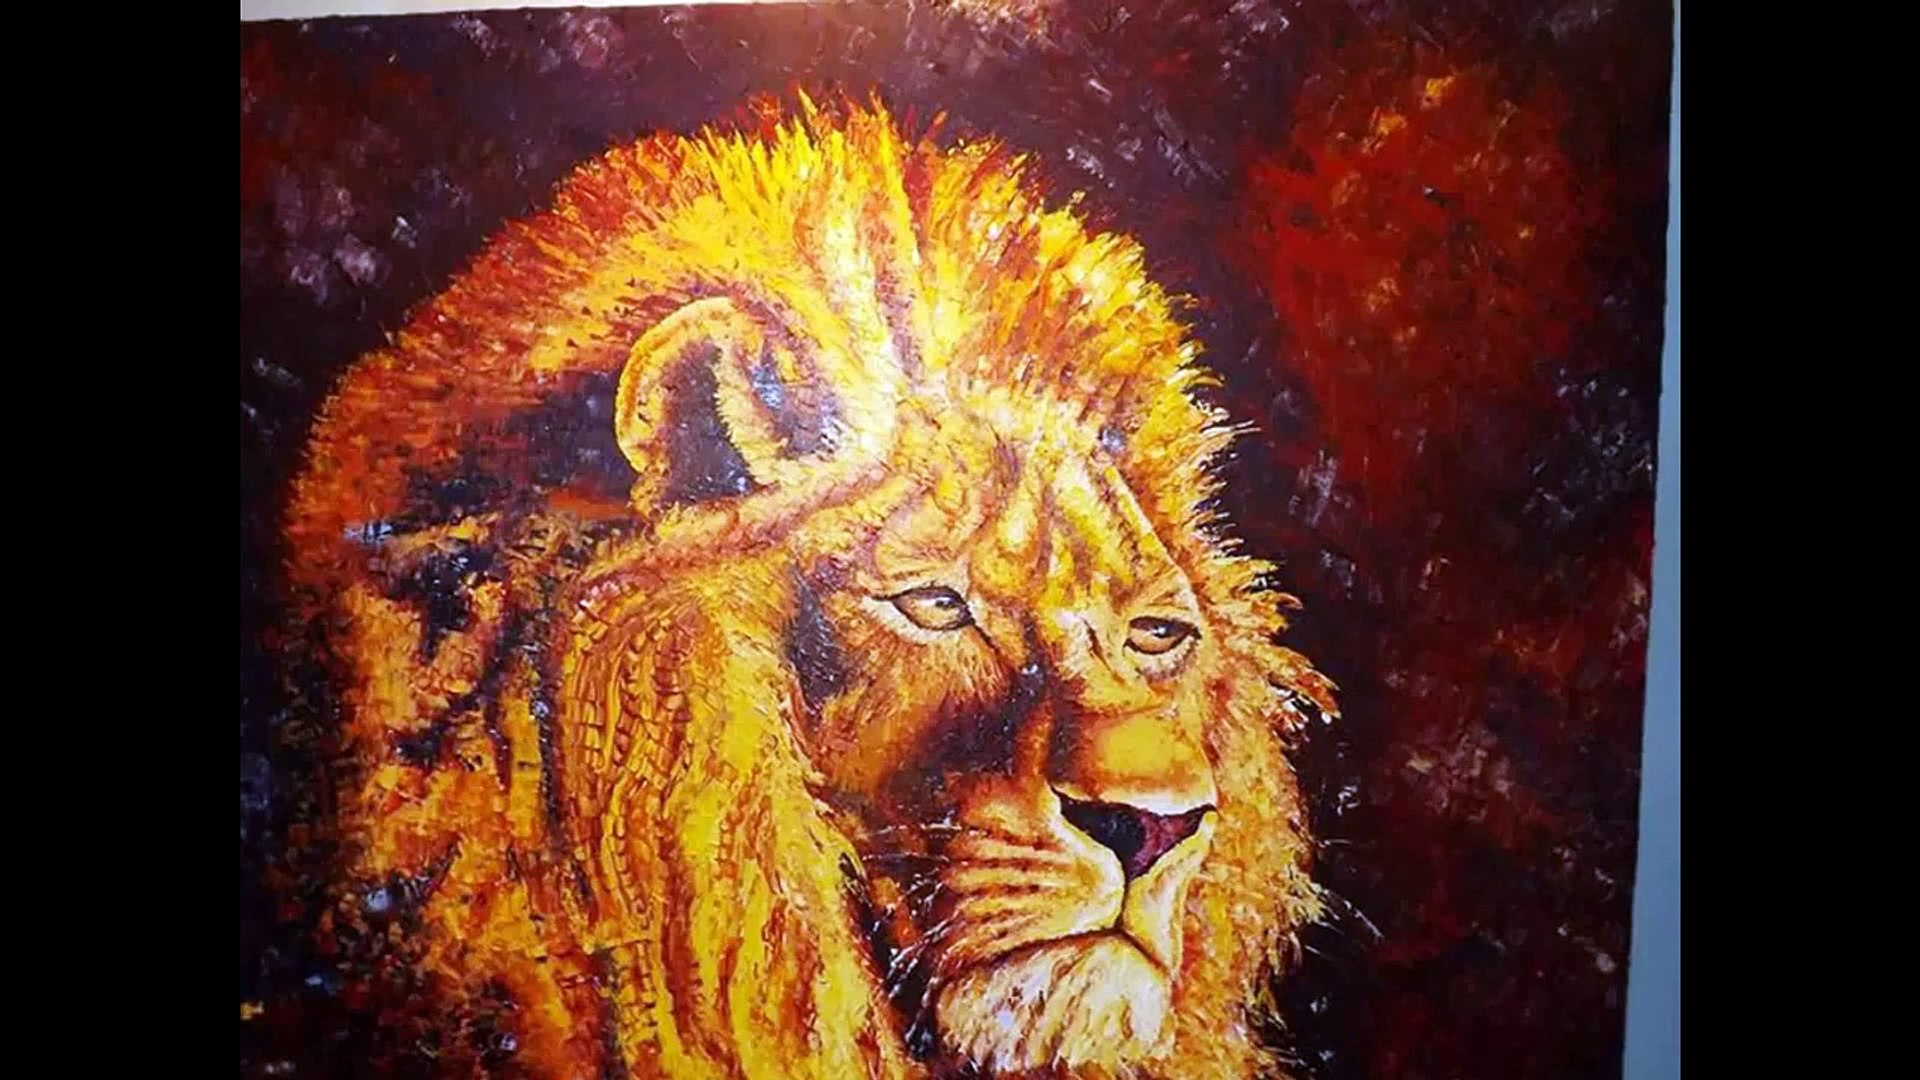 Mural Artist Kenya 0720271544: Mural Artists Kenya/ Wall Mural Artist Kenya